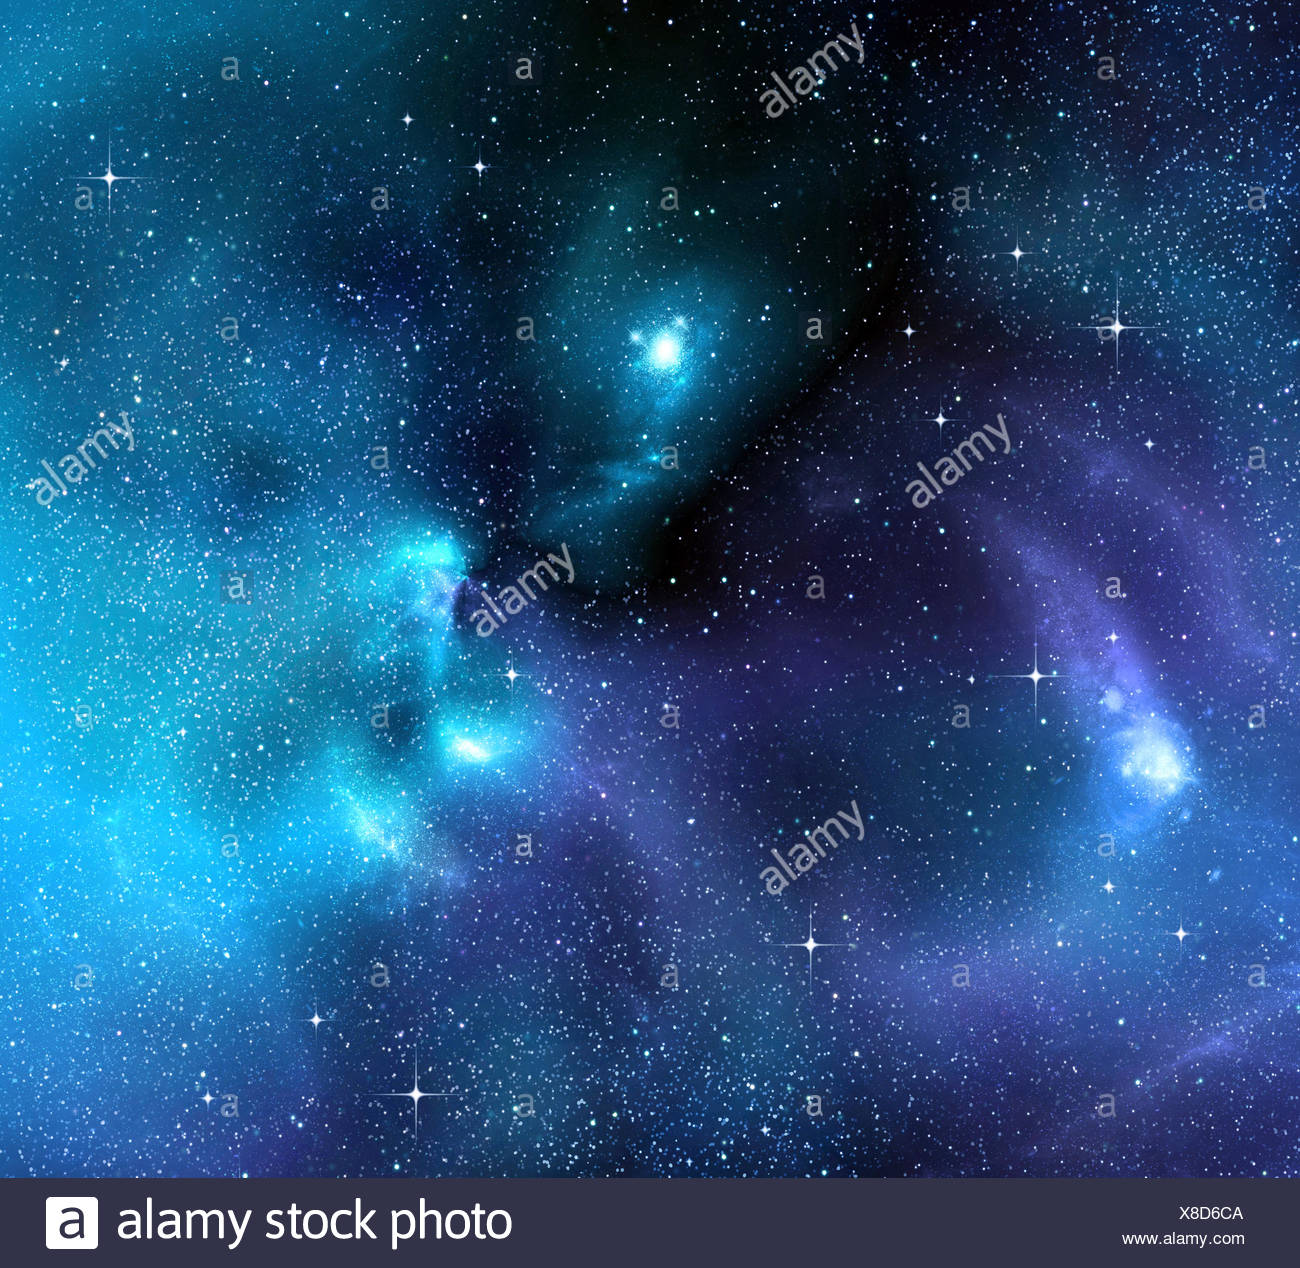 Espacio profundo galaxia Imagen De Stock